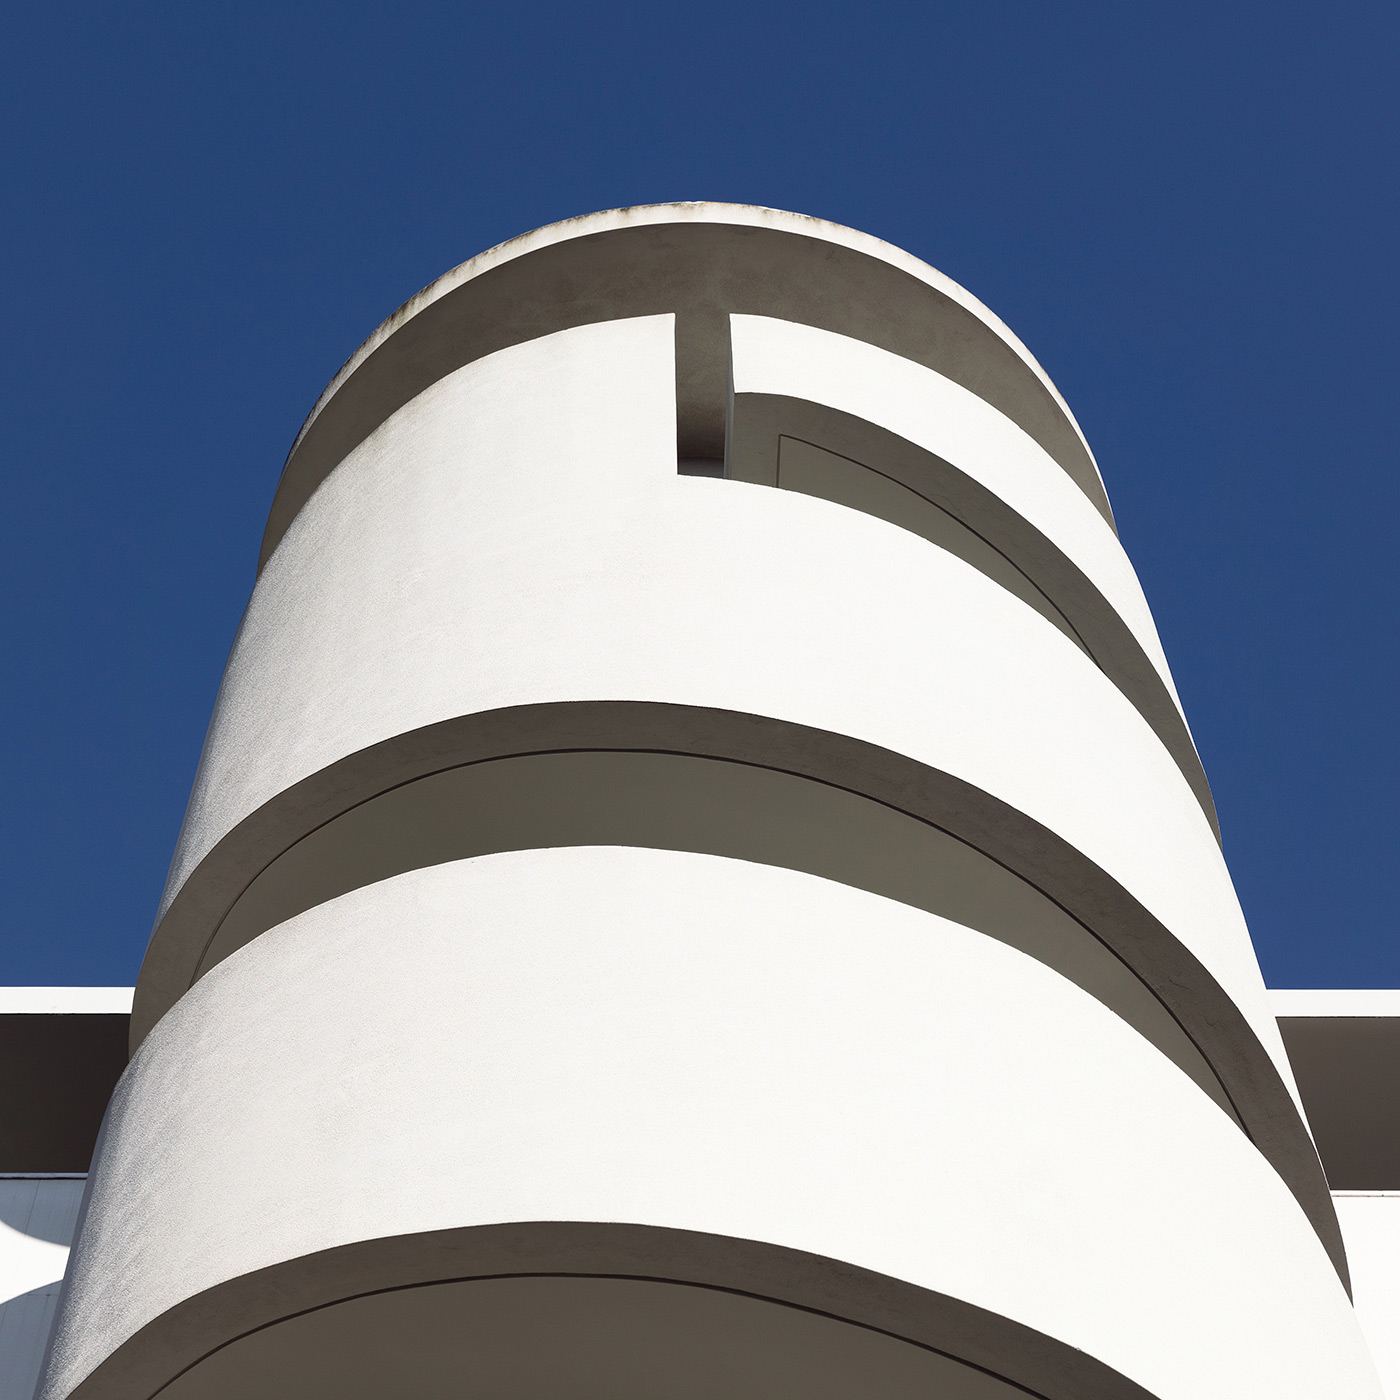 Campus Hospital de Santa Maria . Location: Lisbon, Portugal . Architect: unknown to me